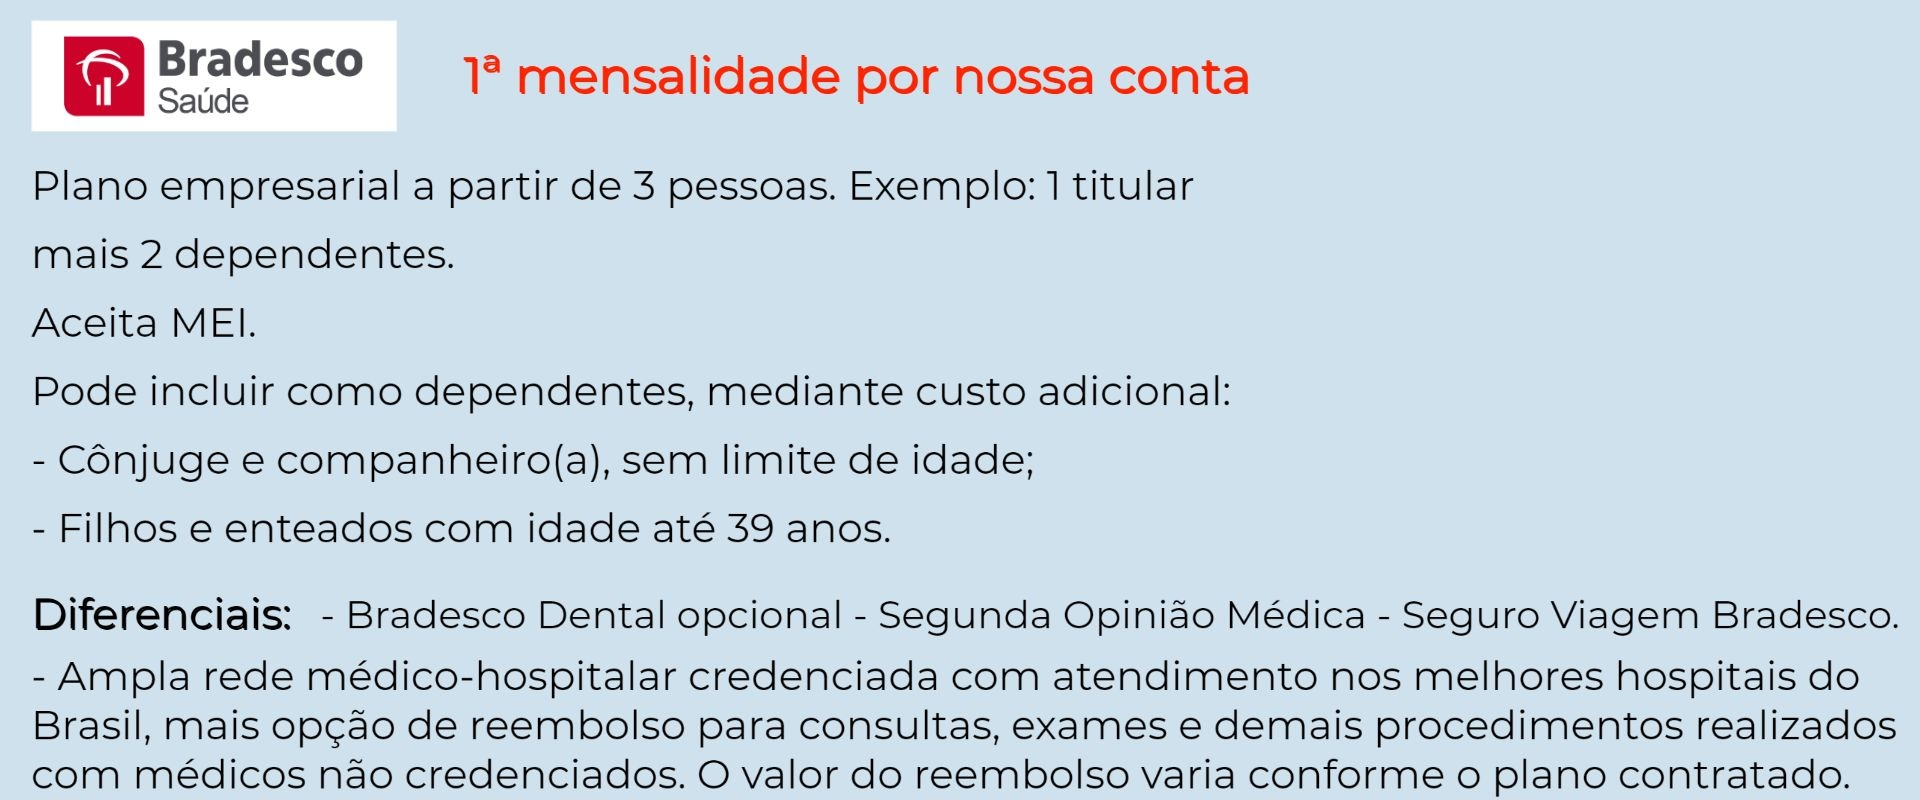 Bradesco Saúde Empresarial - Nova Odessa